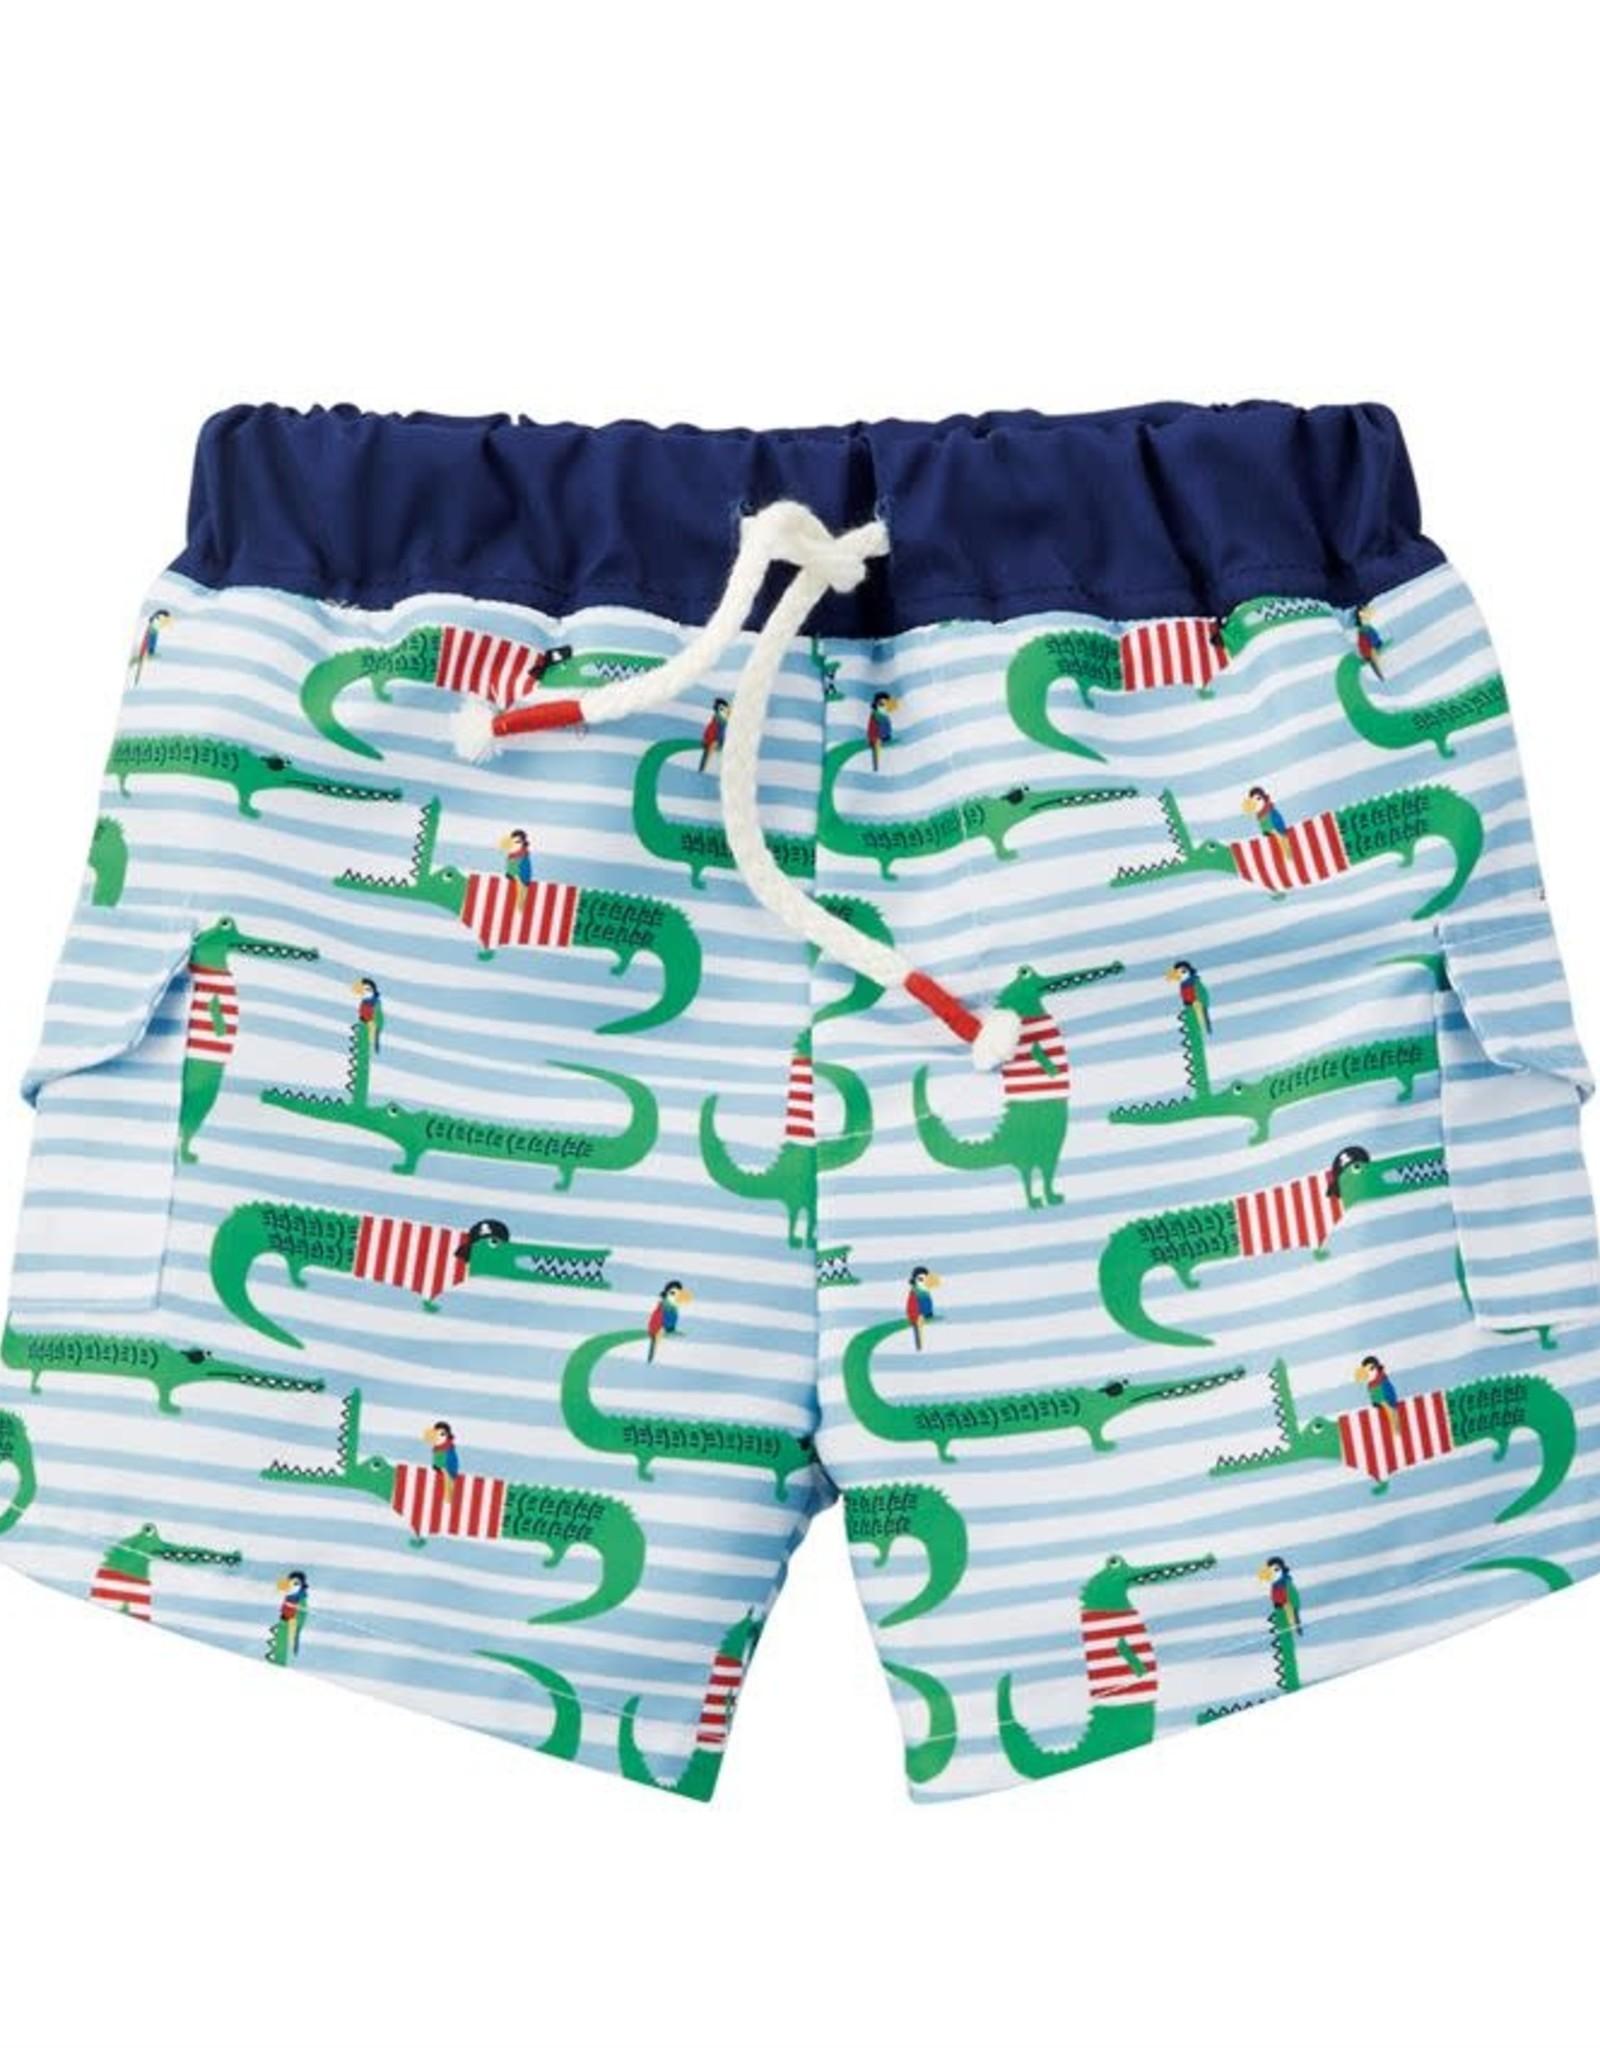 Alligator swimsuit w/rashguard Toddler